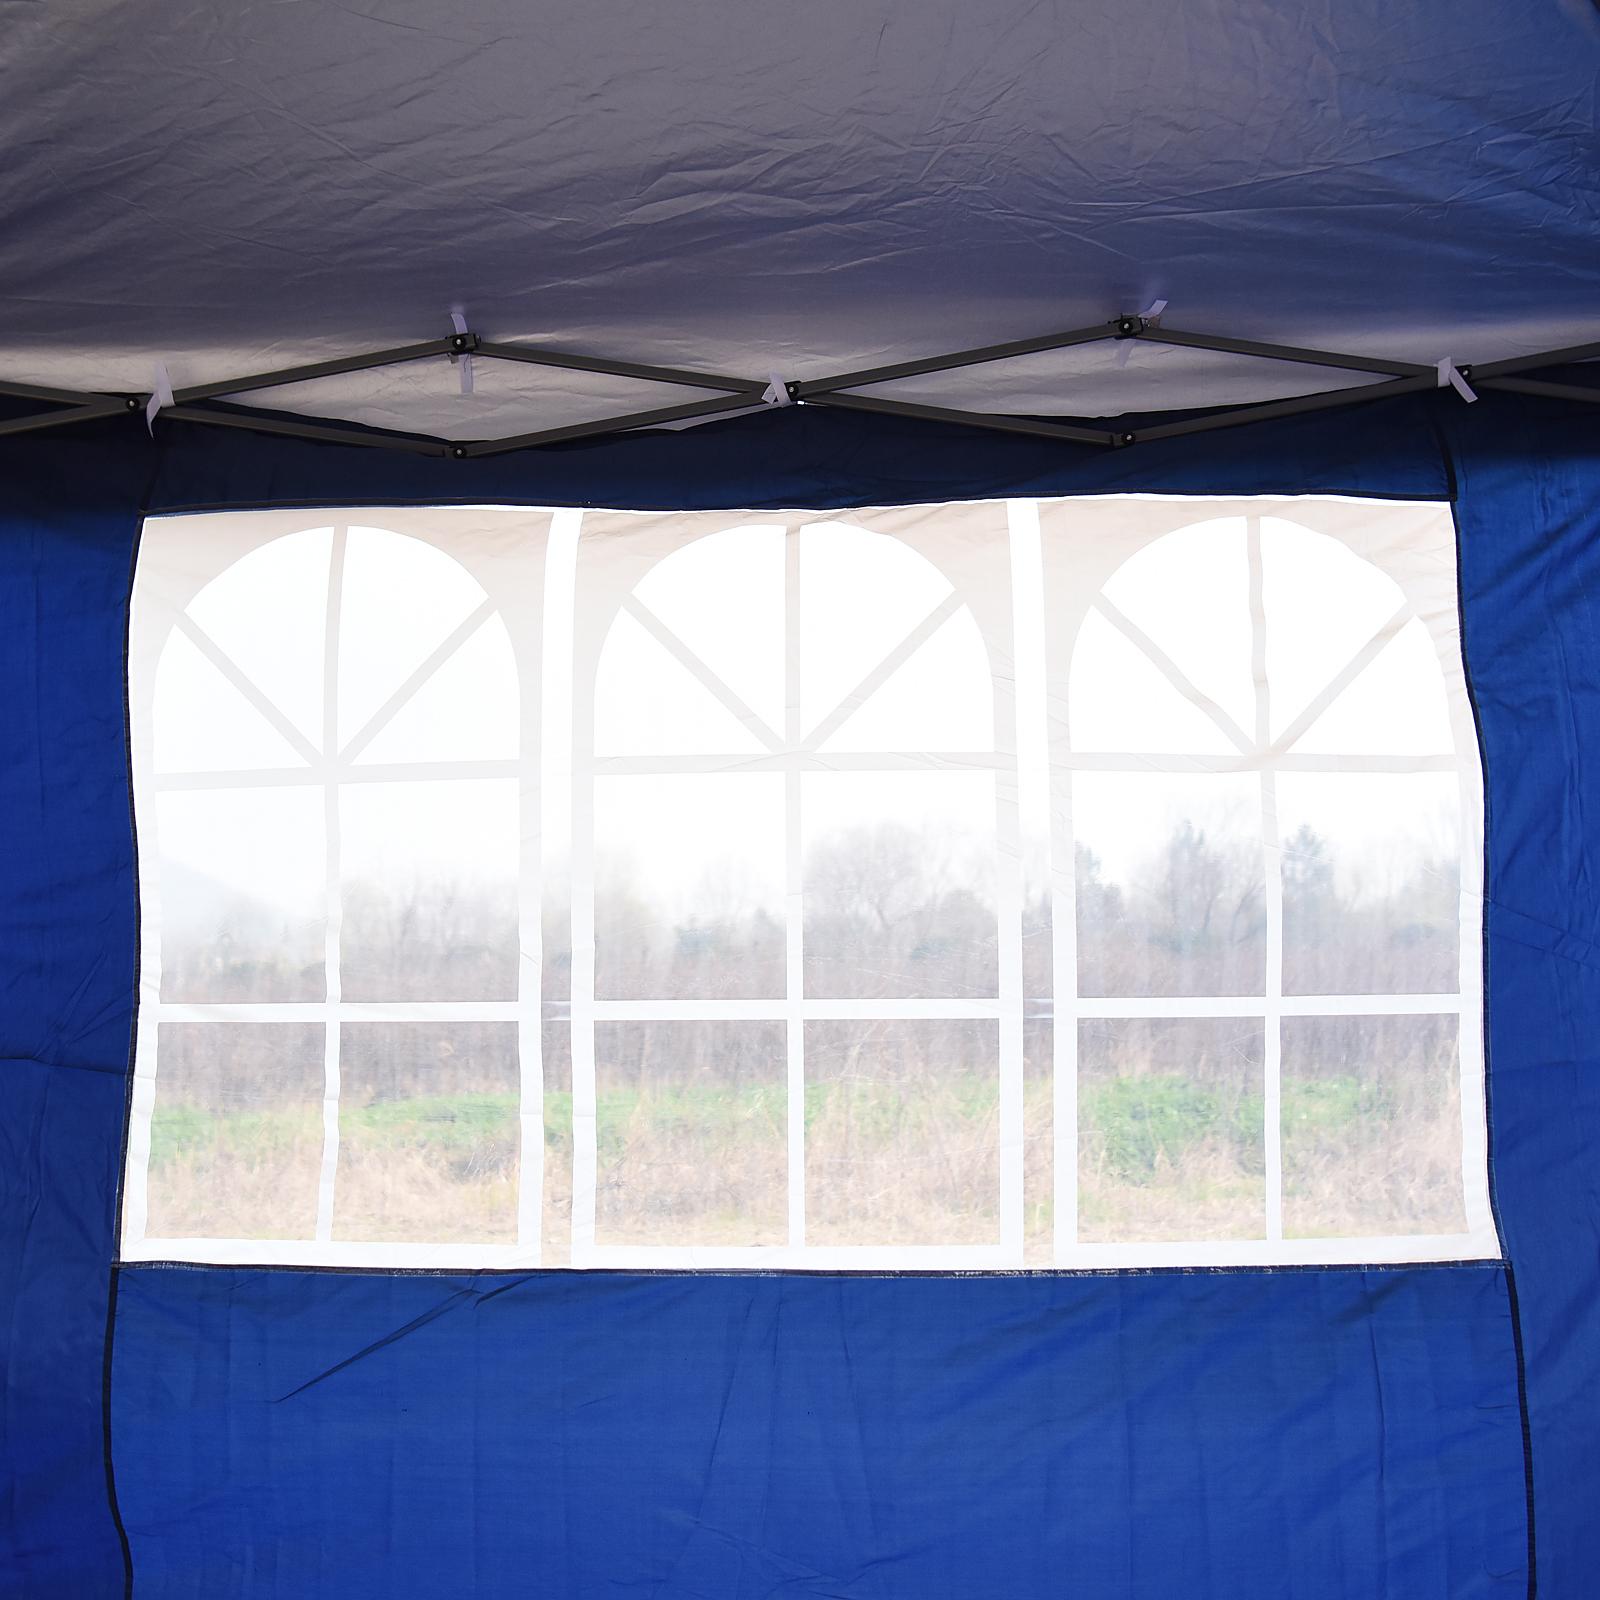 Outdoor-10-039-x20-039-EZ-POP-UP-Gazebo-Wedding-Party-Tent-Canopy-Folding-w-Carry-Bag thumbnail 10